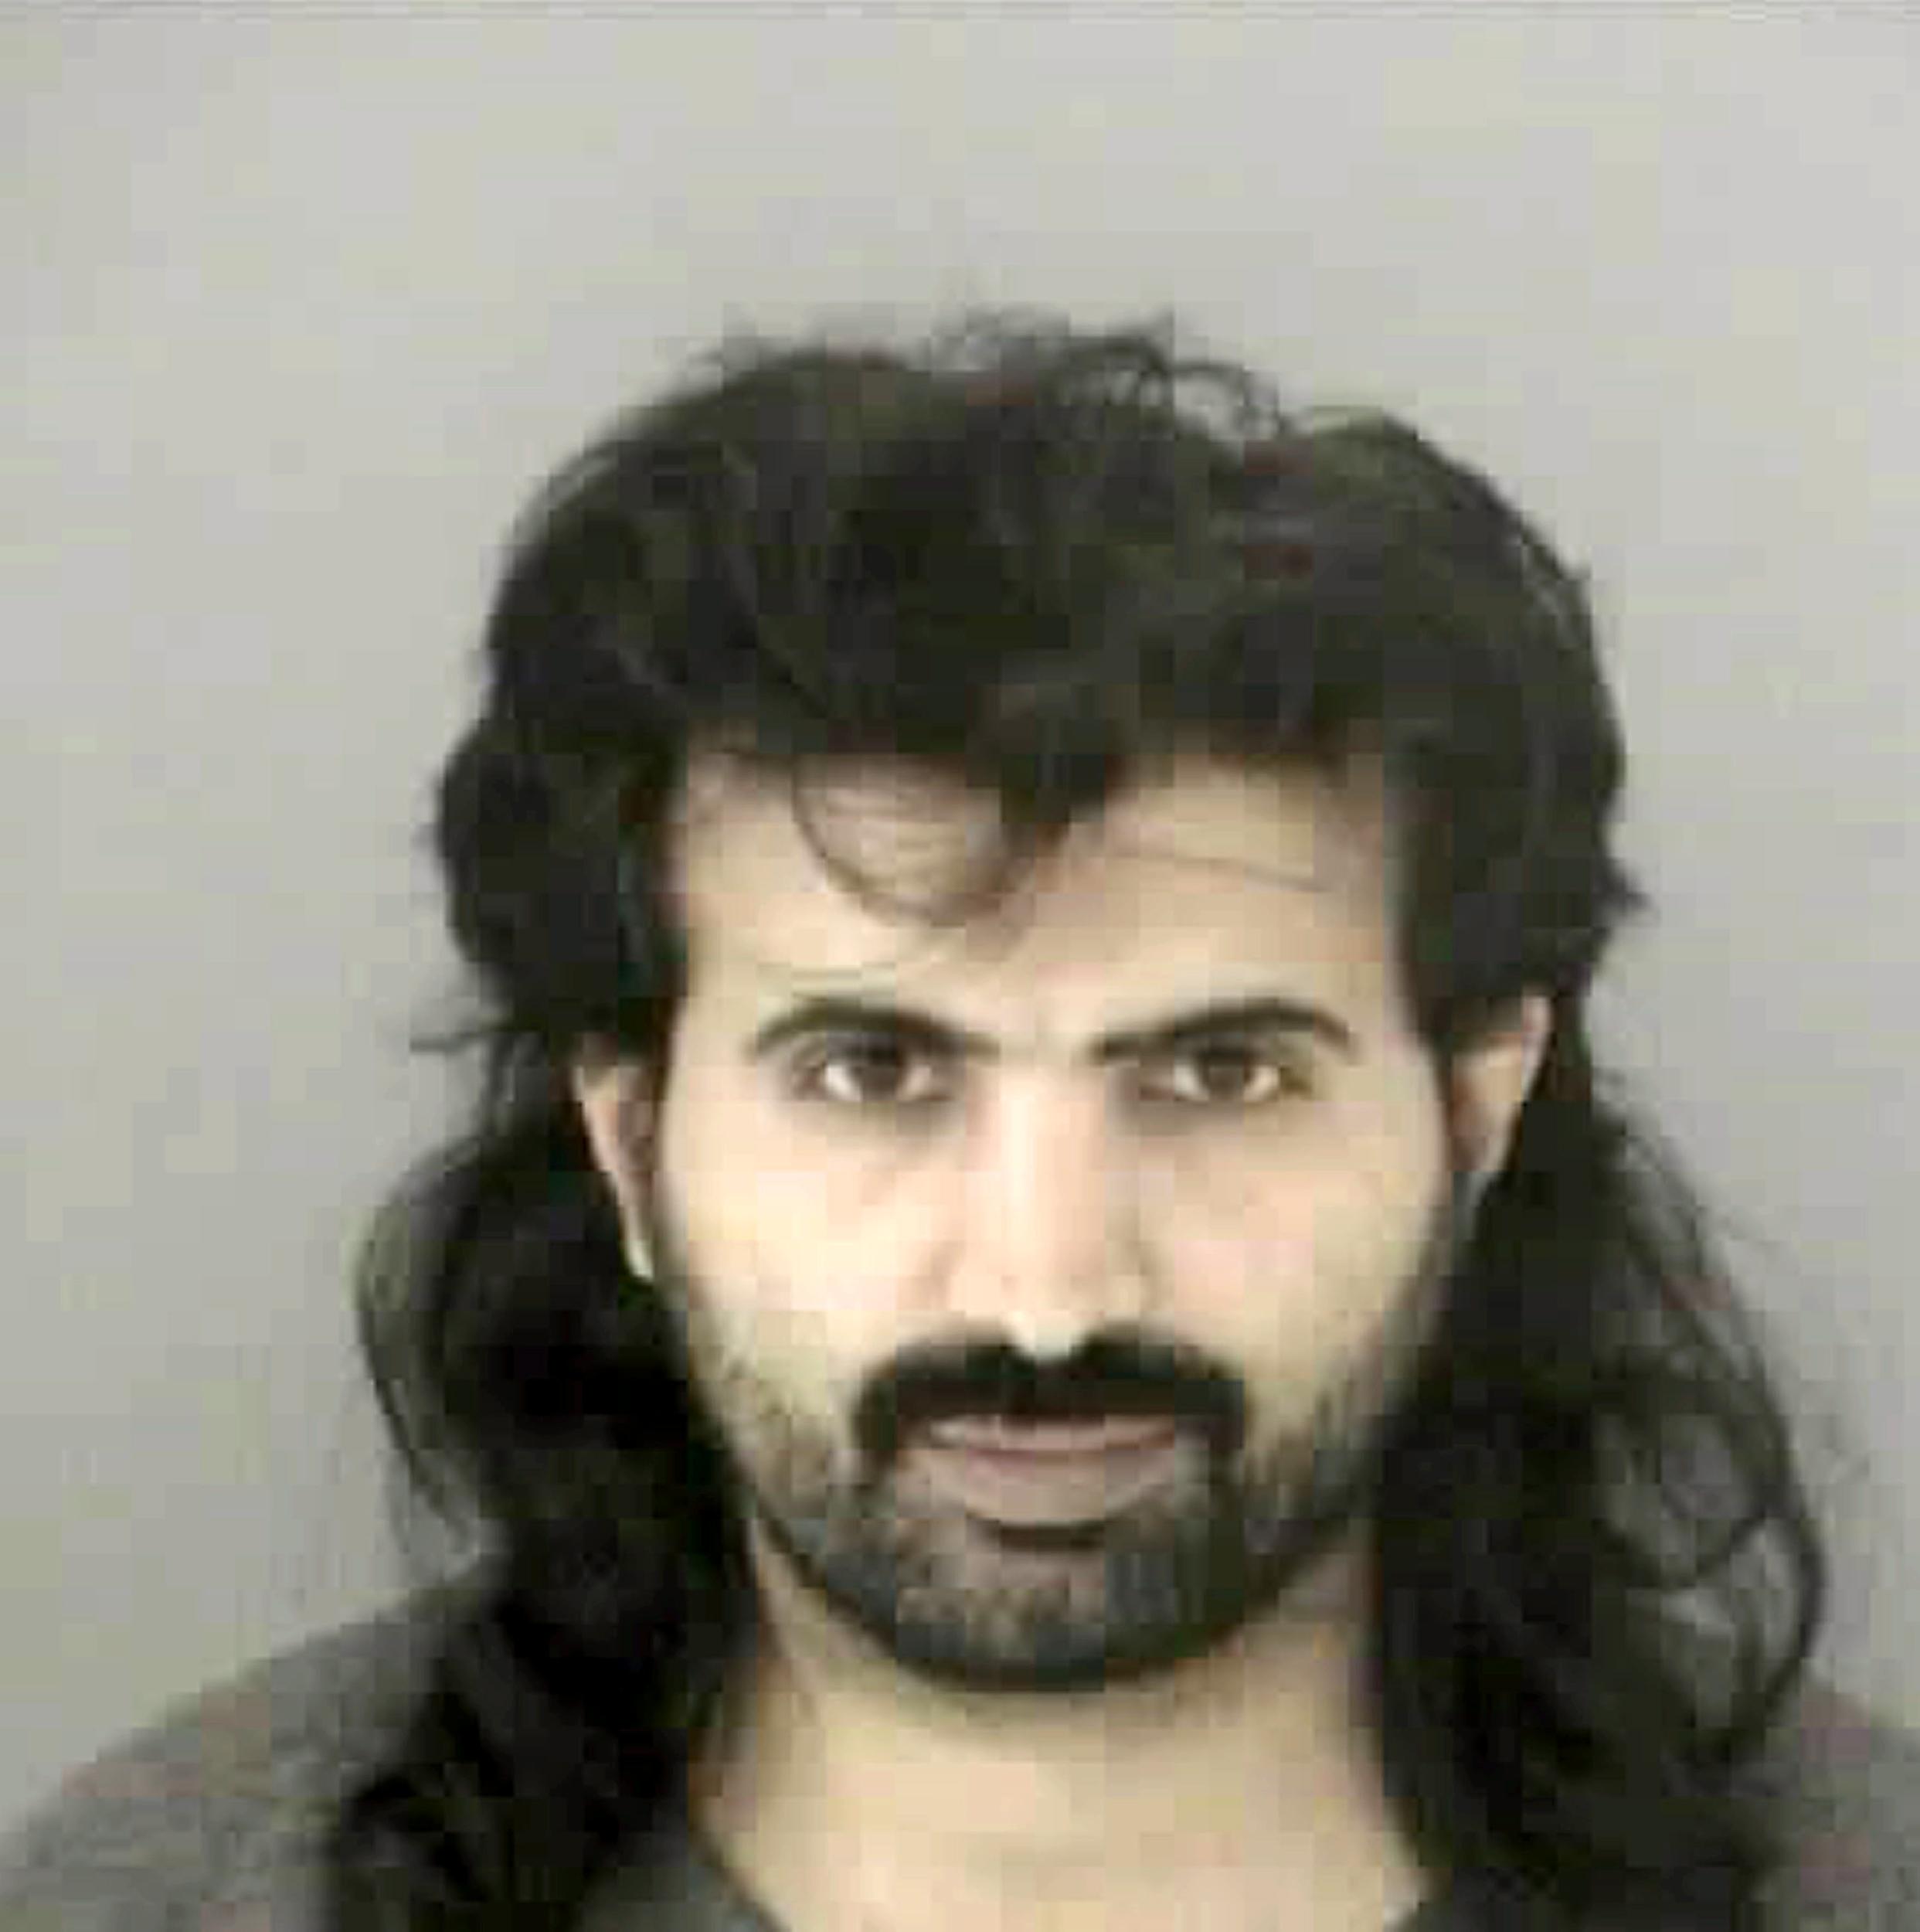 Image: Al Qaida Suspect Transferred To DOD